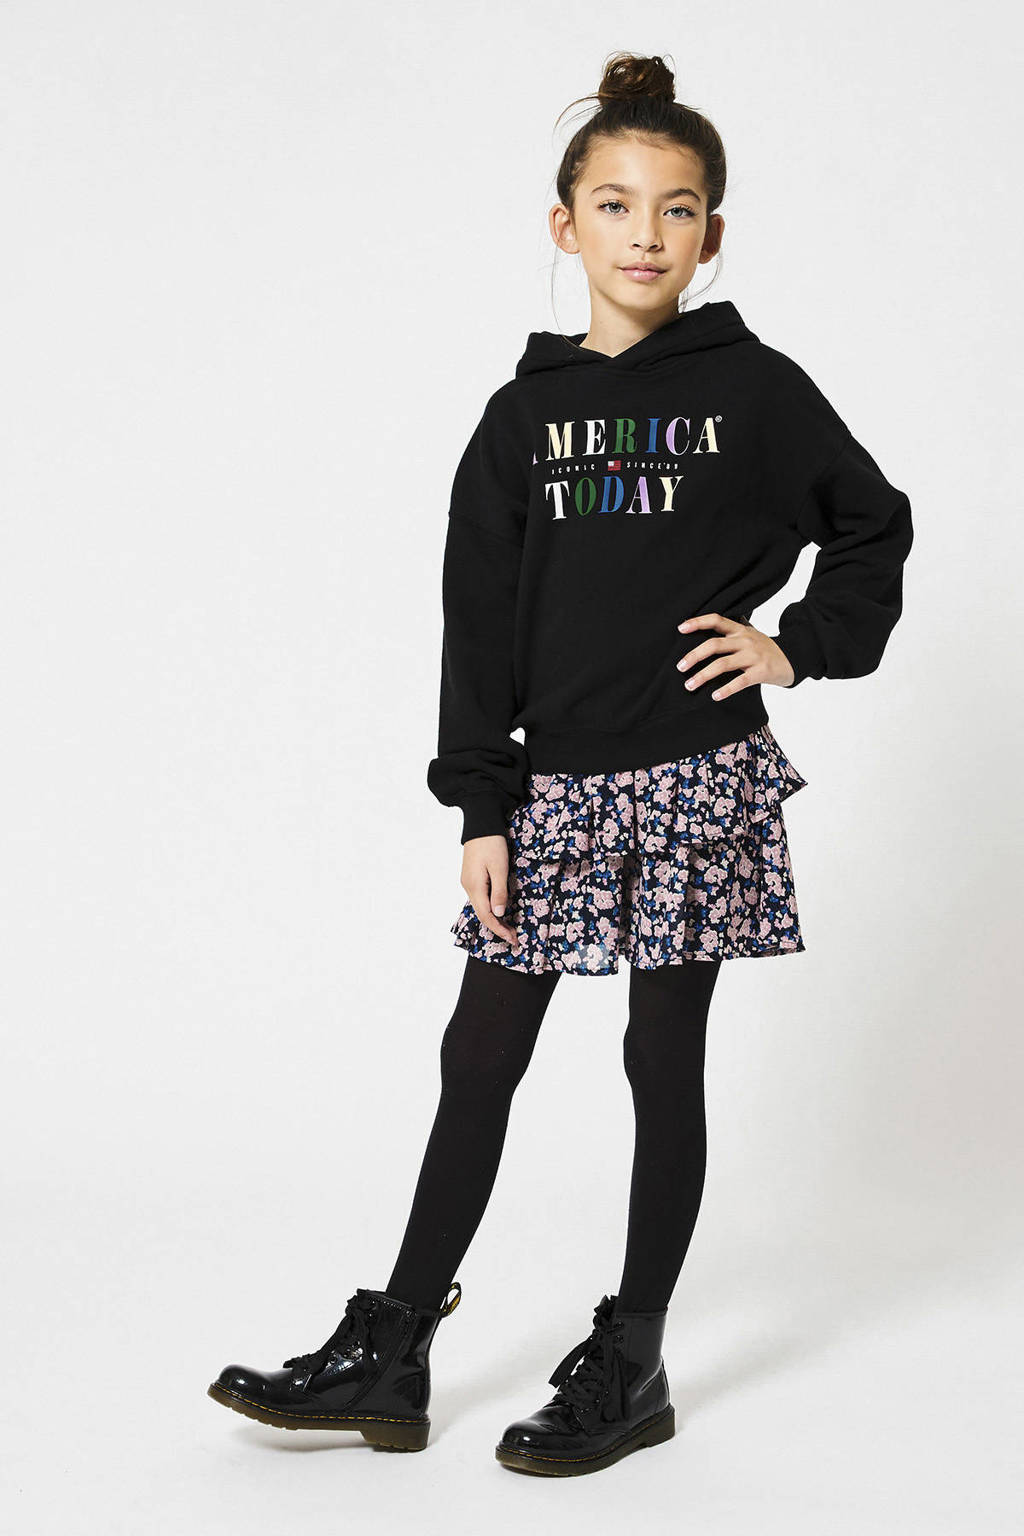 America Today Junior rok Rosalin van gerecycled polyester donkerblauw/roze/blauw, Donkerblauw/roze/blauw